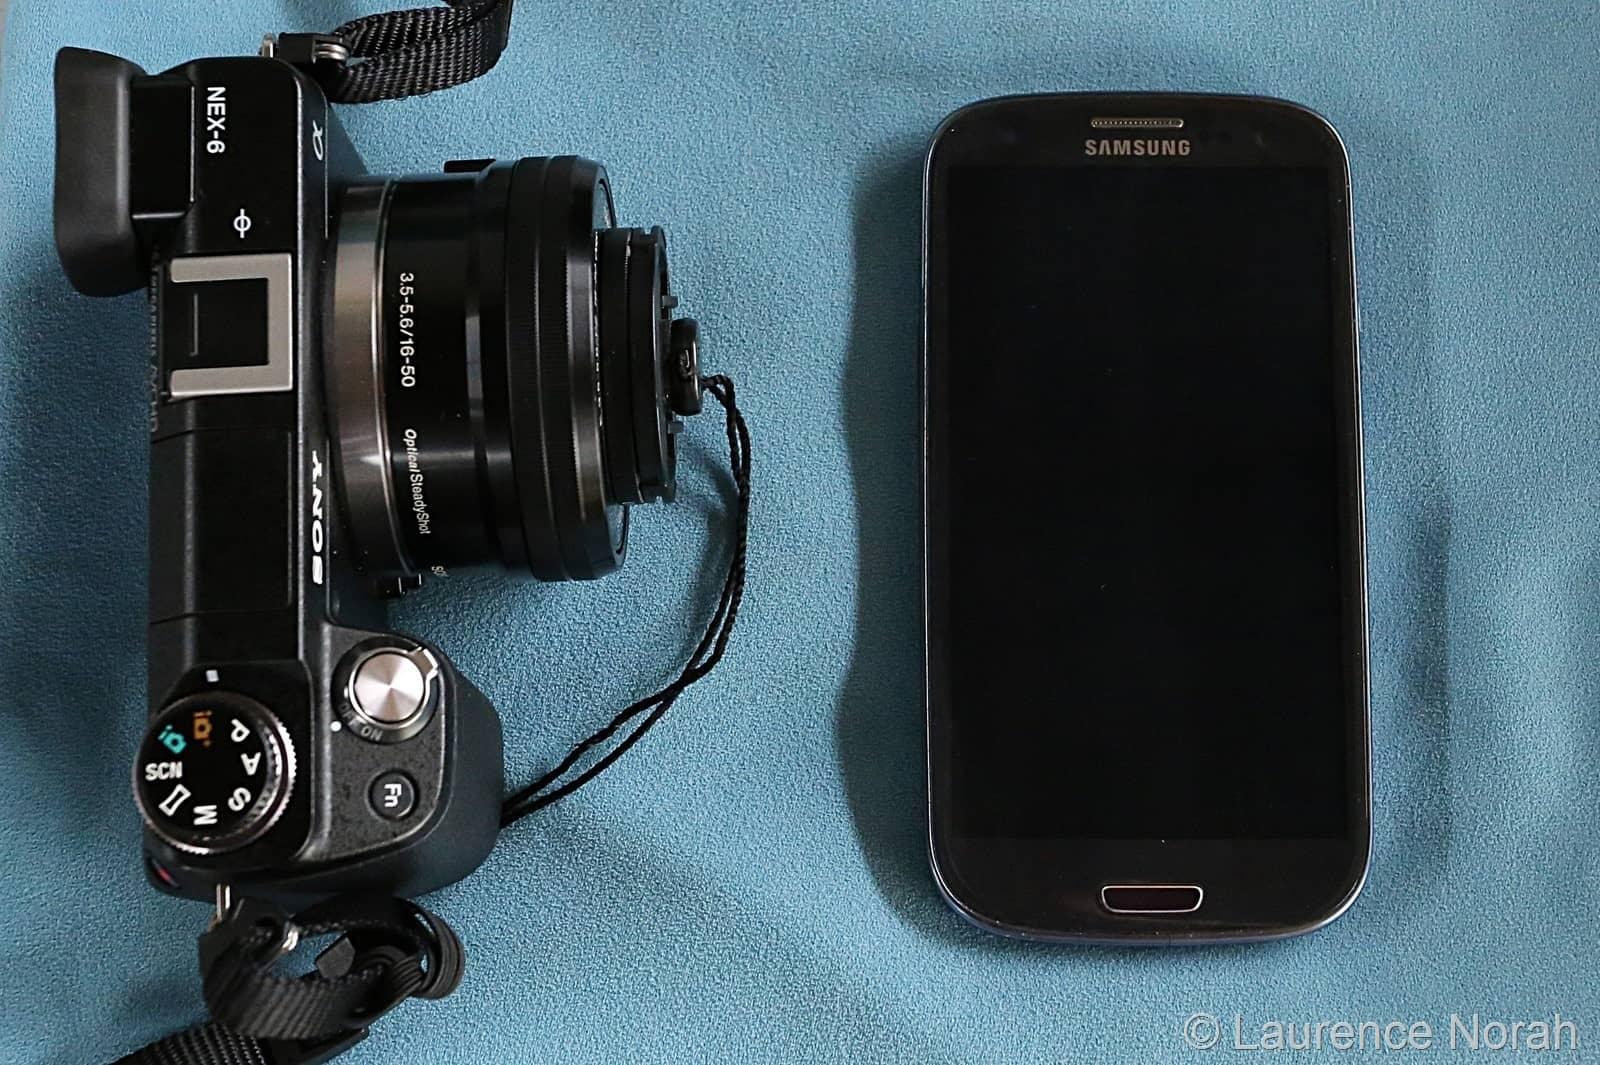 NEX6 next to galaxy s3 smartphone comparison